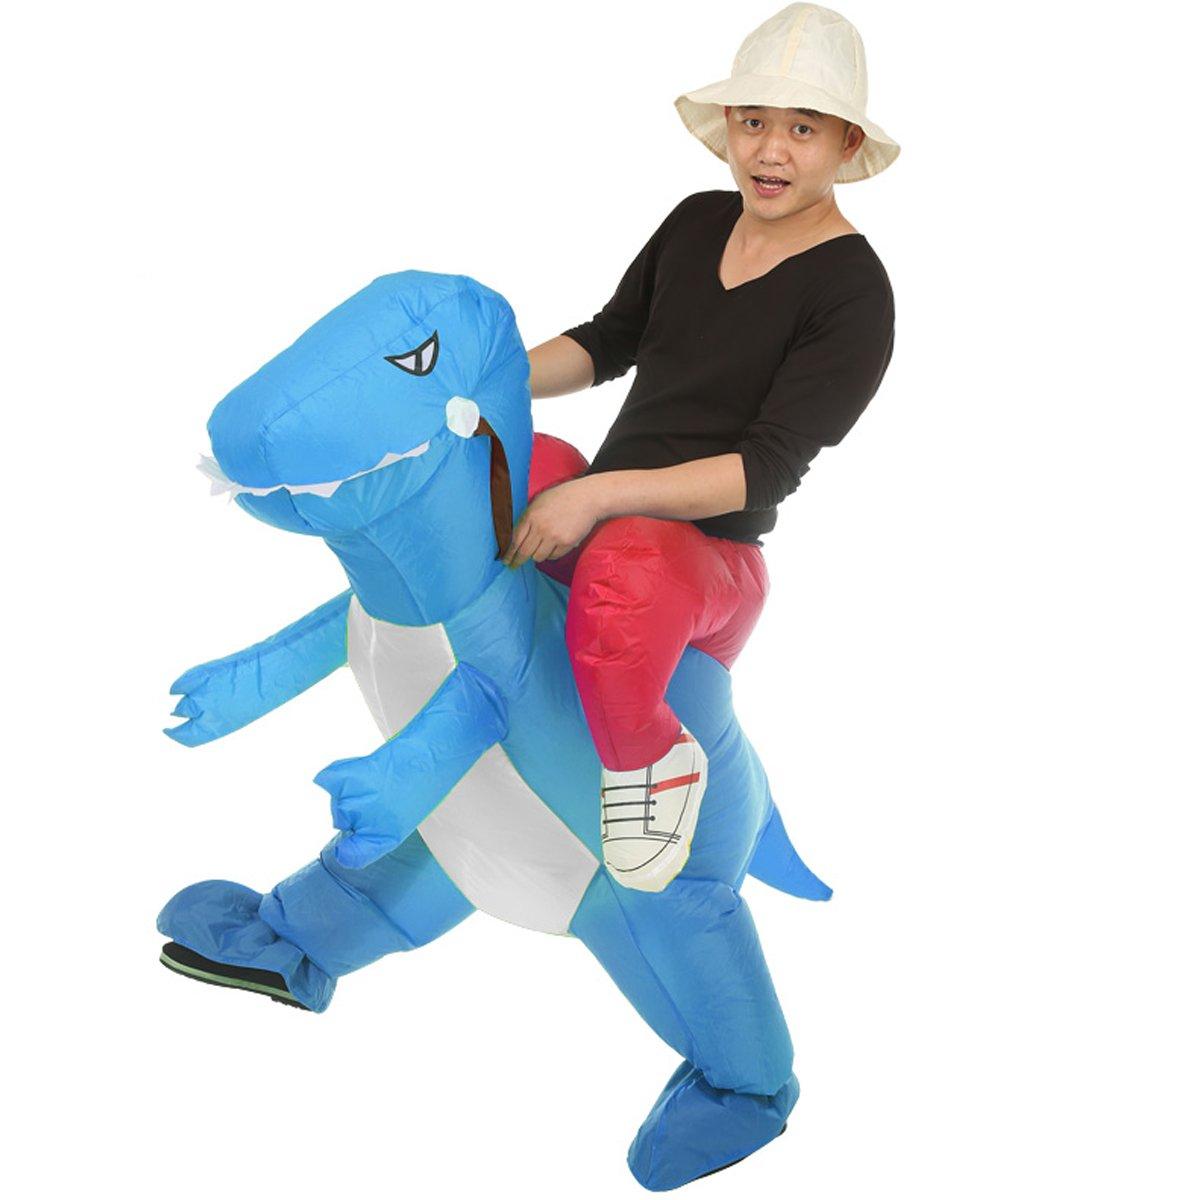 Inflatable Rider Costume Riding Me Fancy Dress Funny Dinosaur Unicorn Funny Suit Mount Kids Adult (Child(90-140CM), Blue)